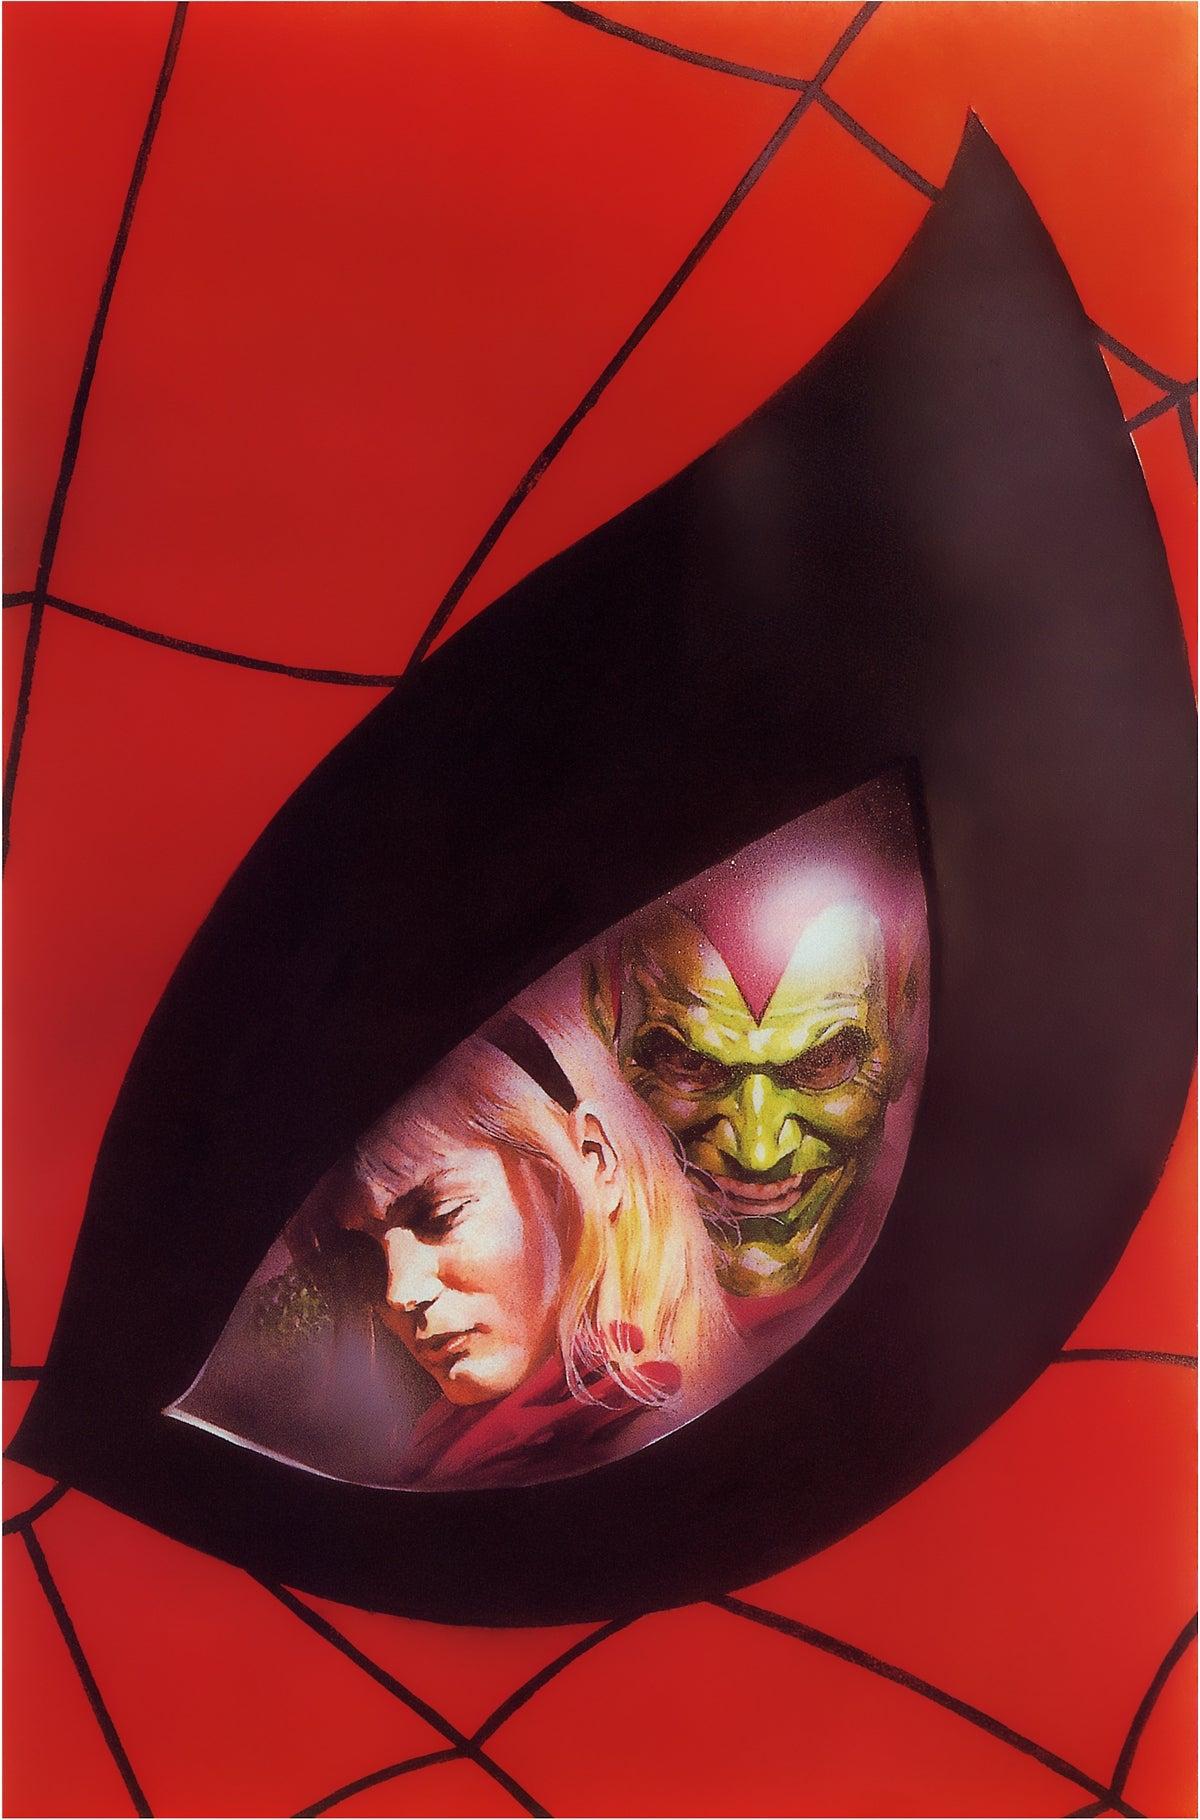 053_daruma_taomc_alex_ross_gwen_stacy_the_green_goblin__spider-man